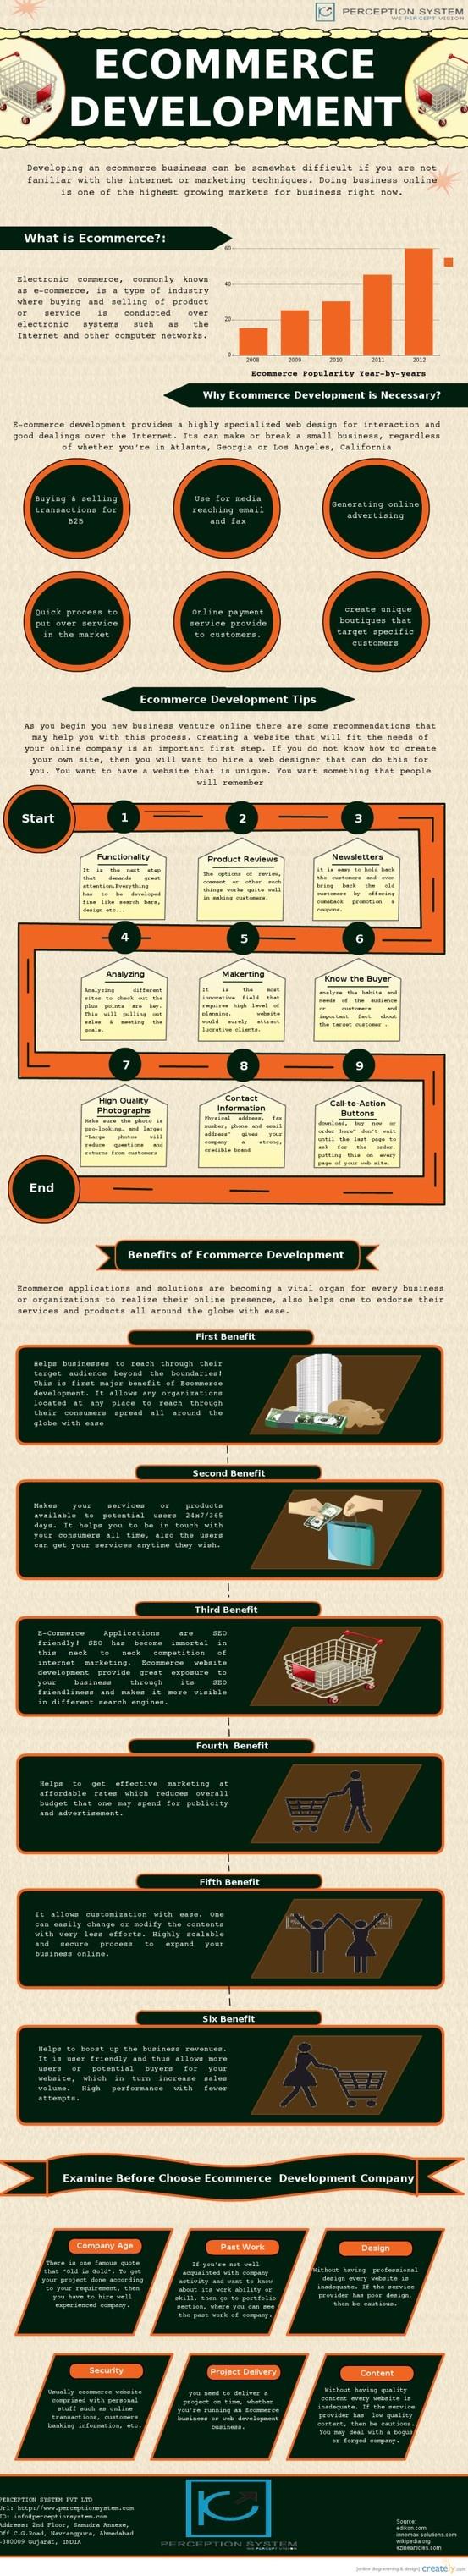 Ecommerce development #infografia #infographic #ecommerce